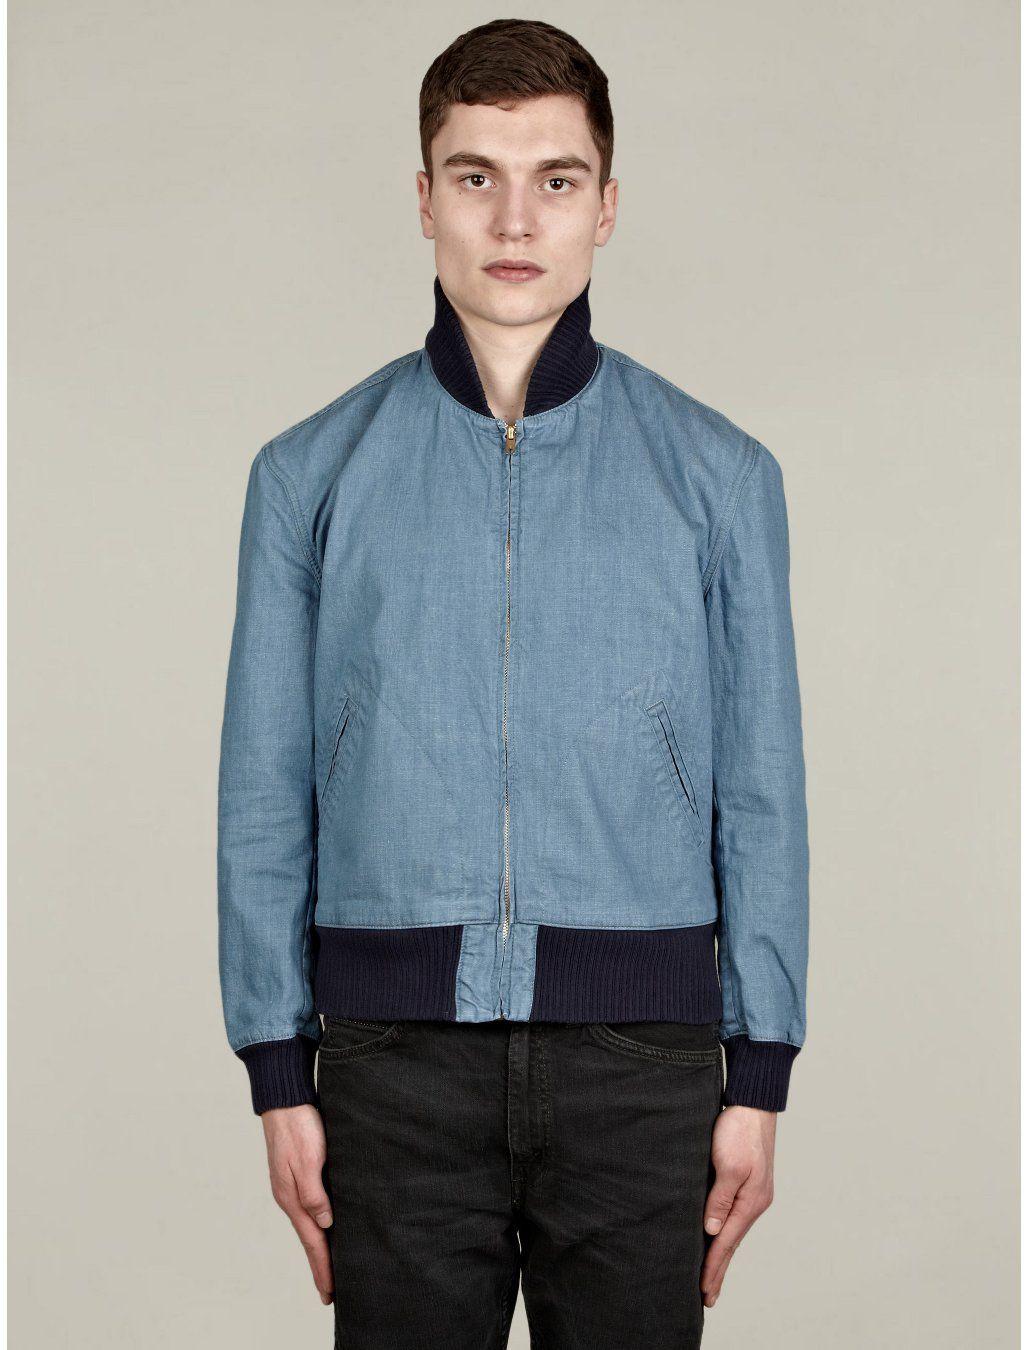 Levis Vintage Clothing Mens 1960s Sky Blue Denim Bomber Jacket Vintage Clothing Men Levis Vintage Clothing Designer Outerwear [ 1350 x 1027 Pixel ]